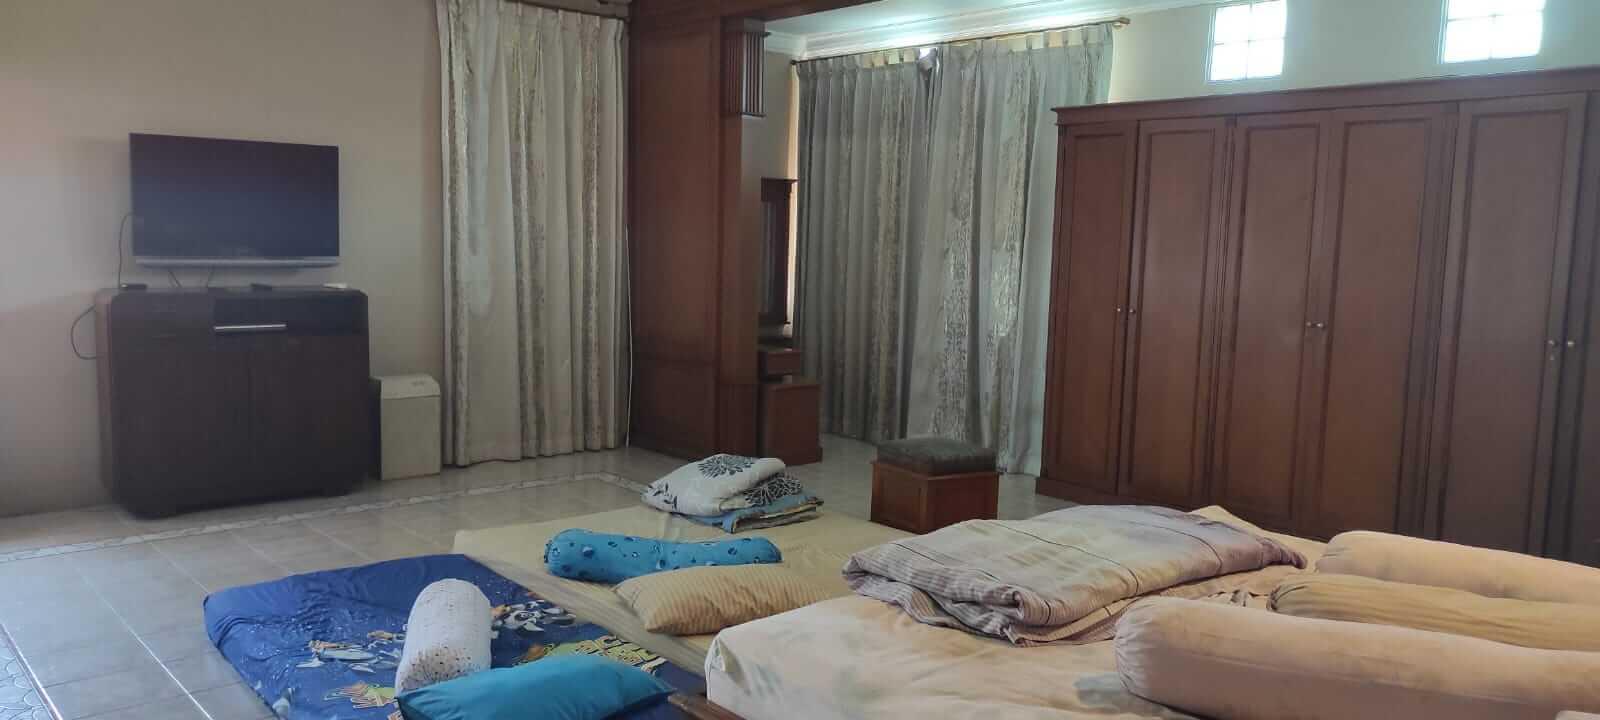 kamar tidur villa andaru gerlong bandung